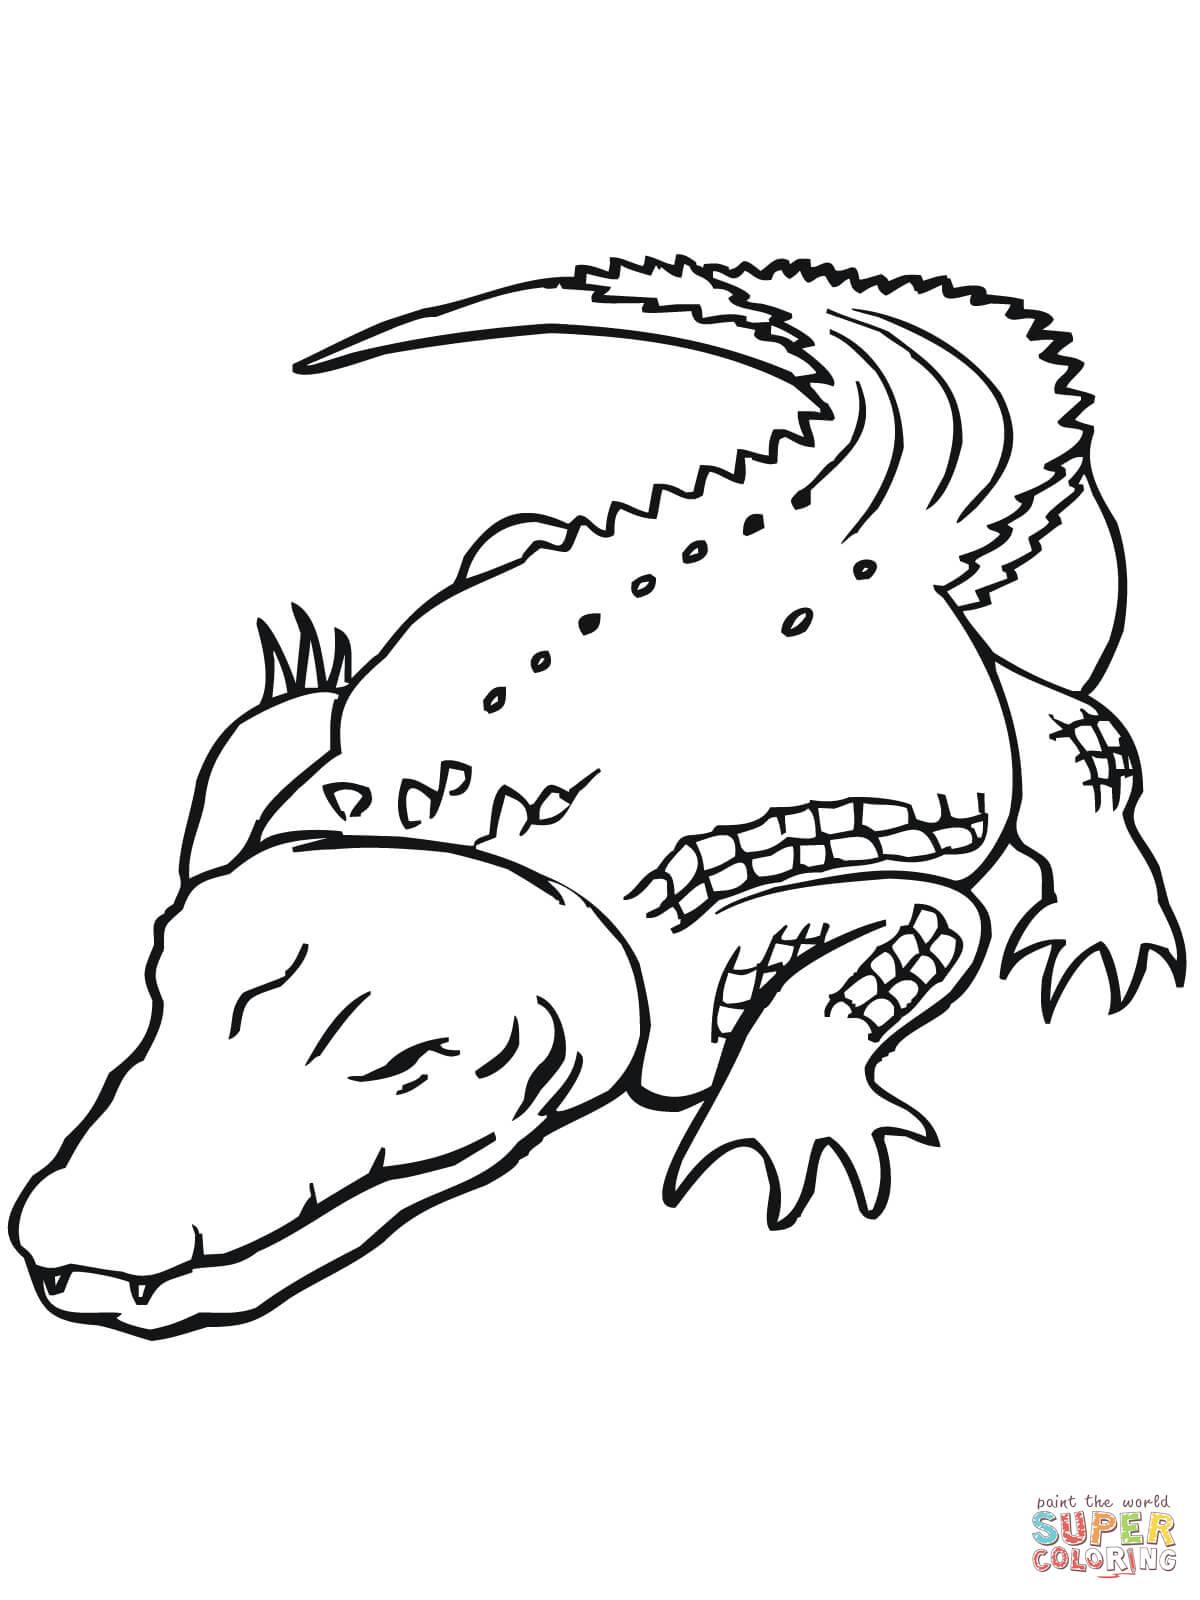 Australian Saltwater Crocodile Coloring Page | Free Printable - Free Printable Pictures Of Crocodiles